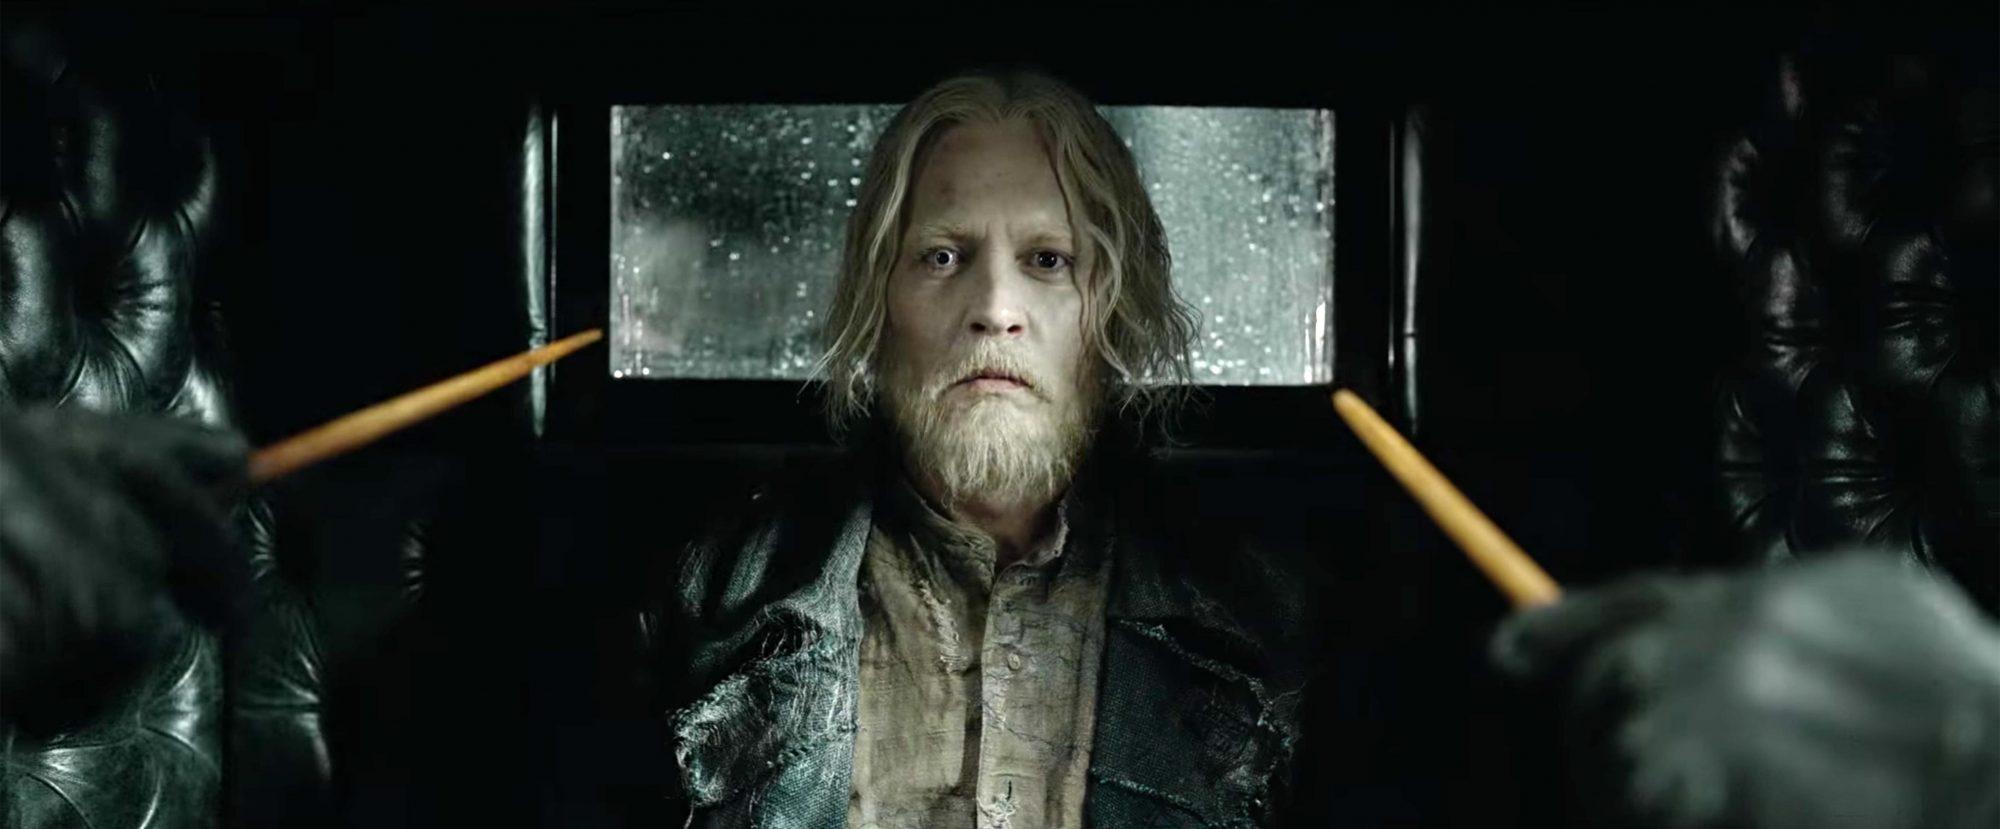 Fantastic Beasts: The Crimes of Grindelwald (screen grab) CR: Warner Bros.